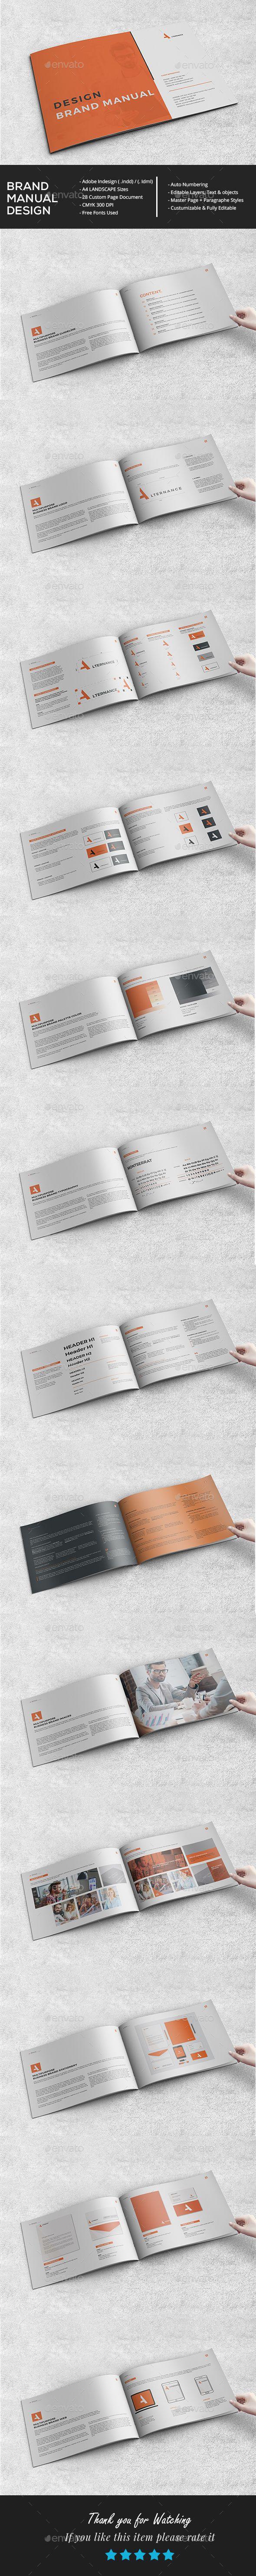 Brand Manual Landscape Brand manual